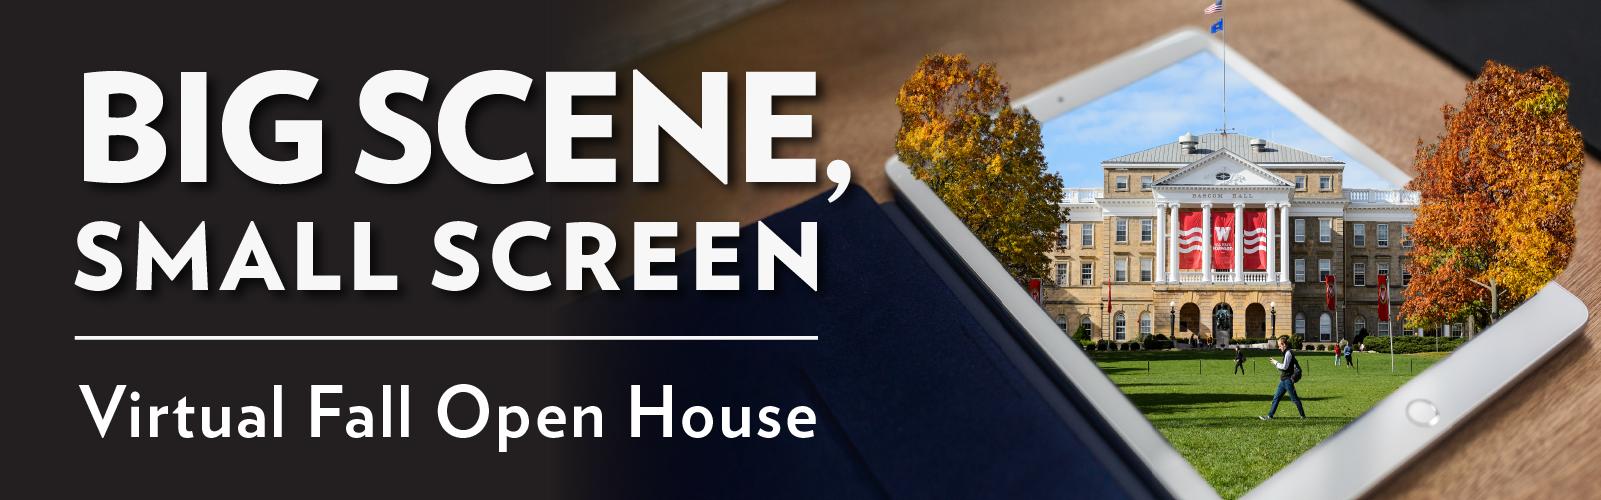 Big Scene, small screen. Virtual Fall Open House